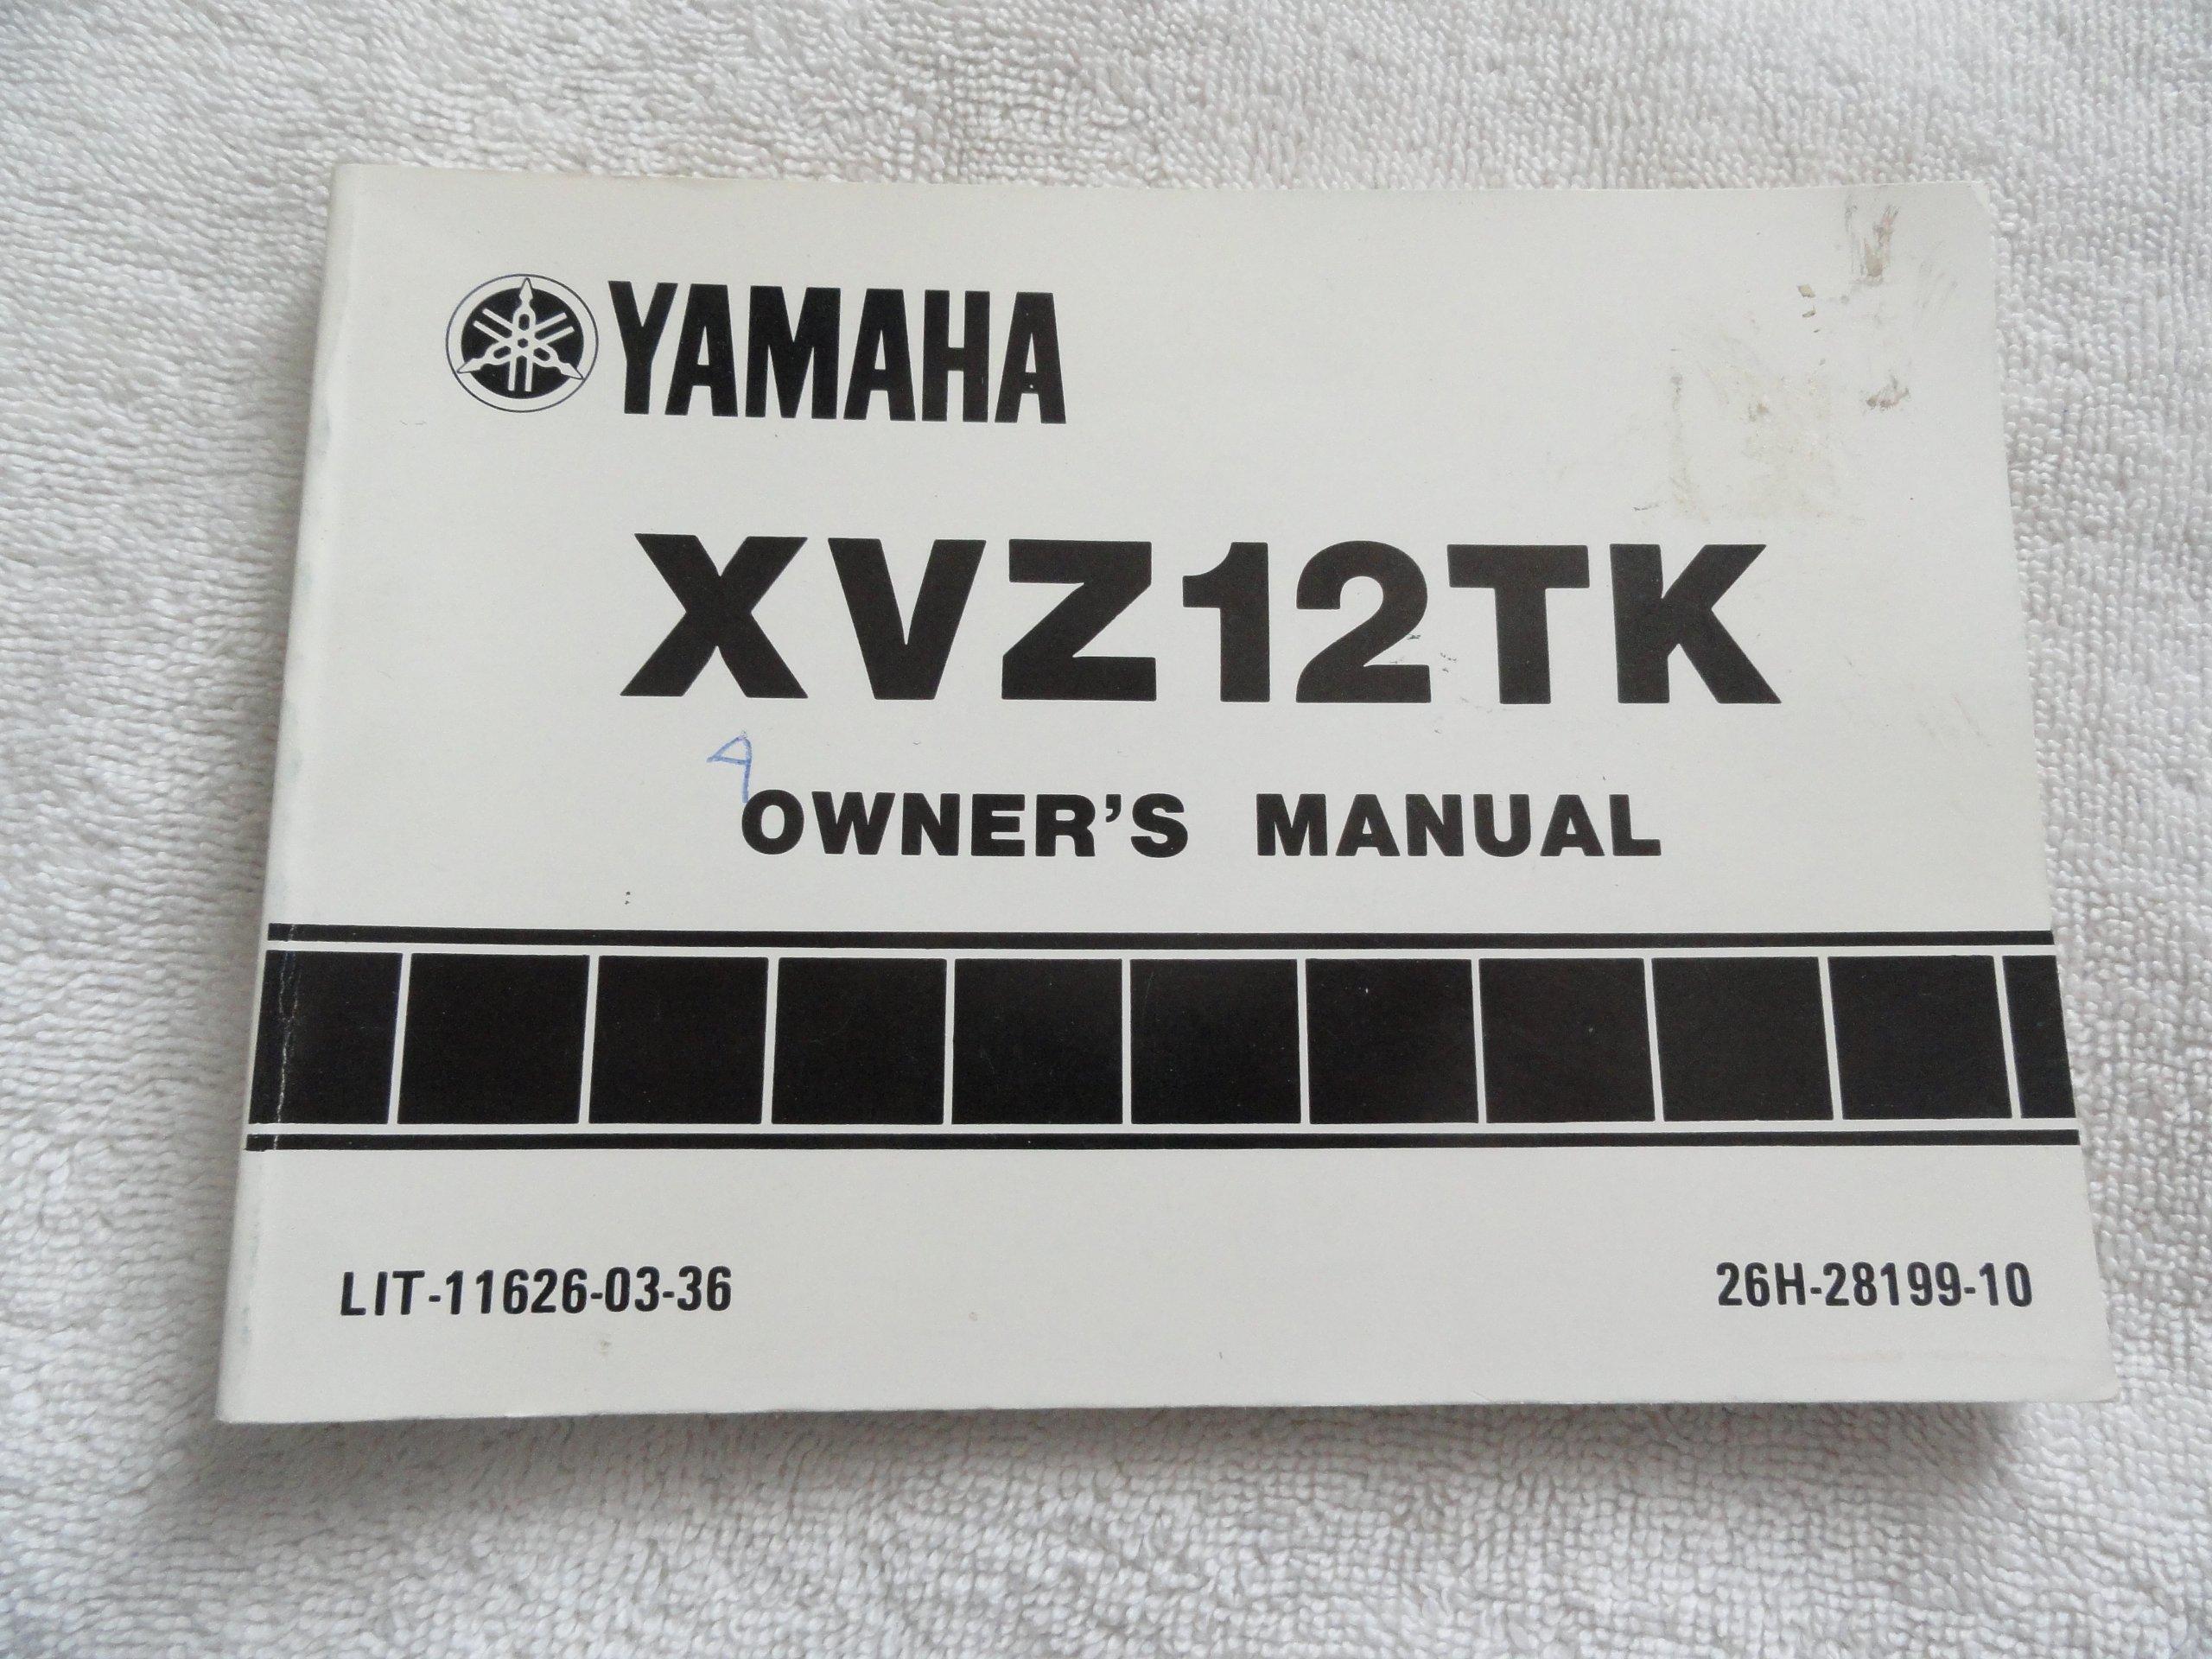 Yamaha Xvz12 Owners Manual Xvz13dt Igniton Fuse Box Holder Owner 11 8 Mb Array 1982 1983 Xvz12tk Xvz 12 Tk Amazon Com Rh